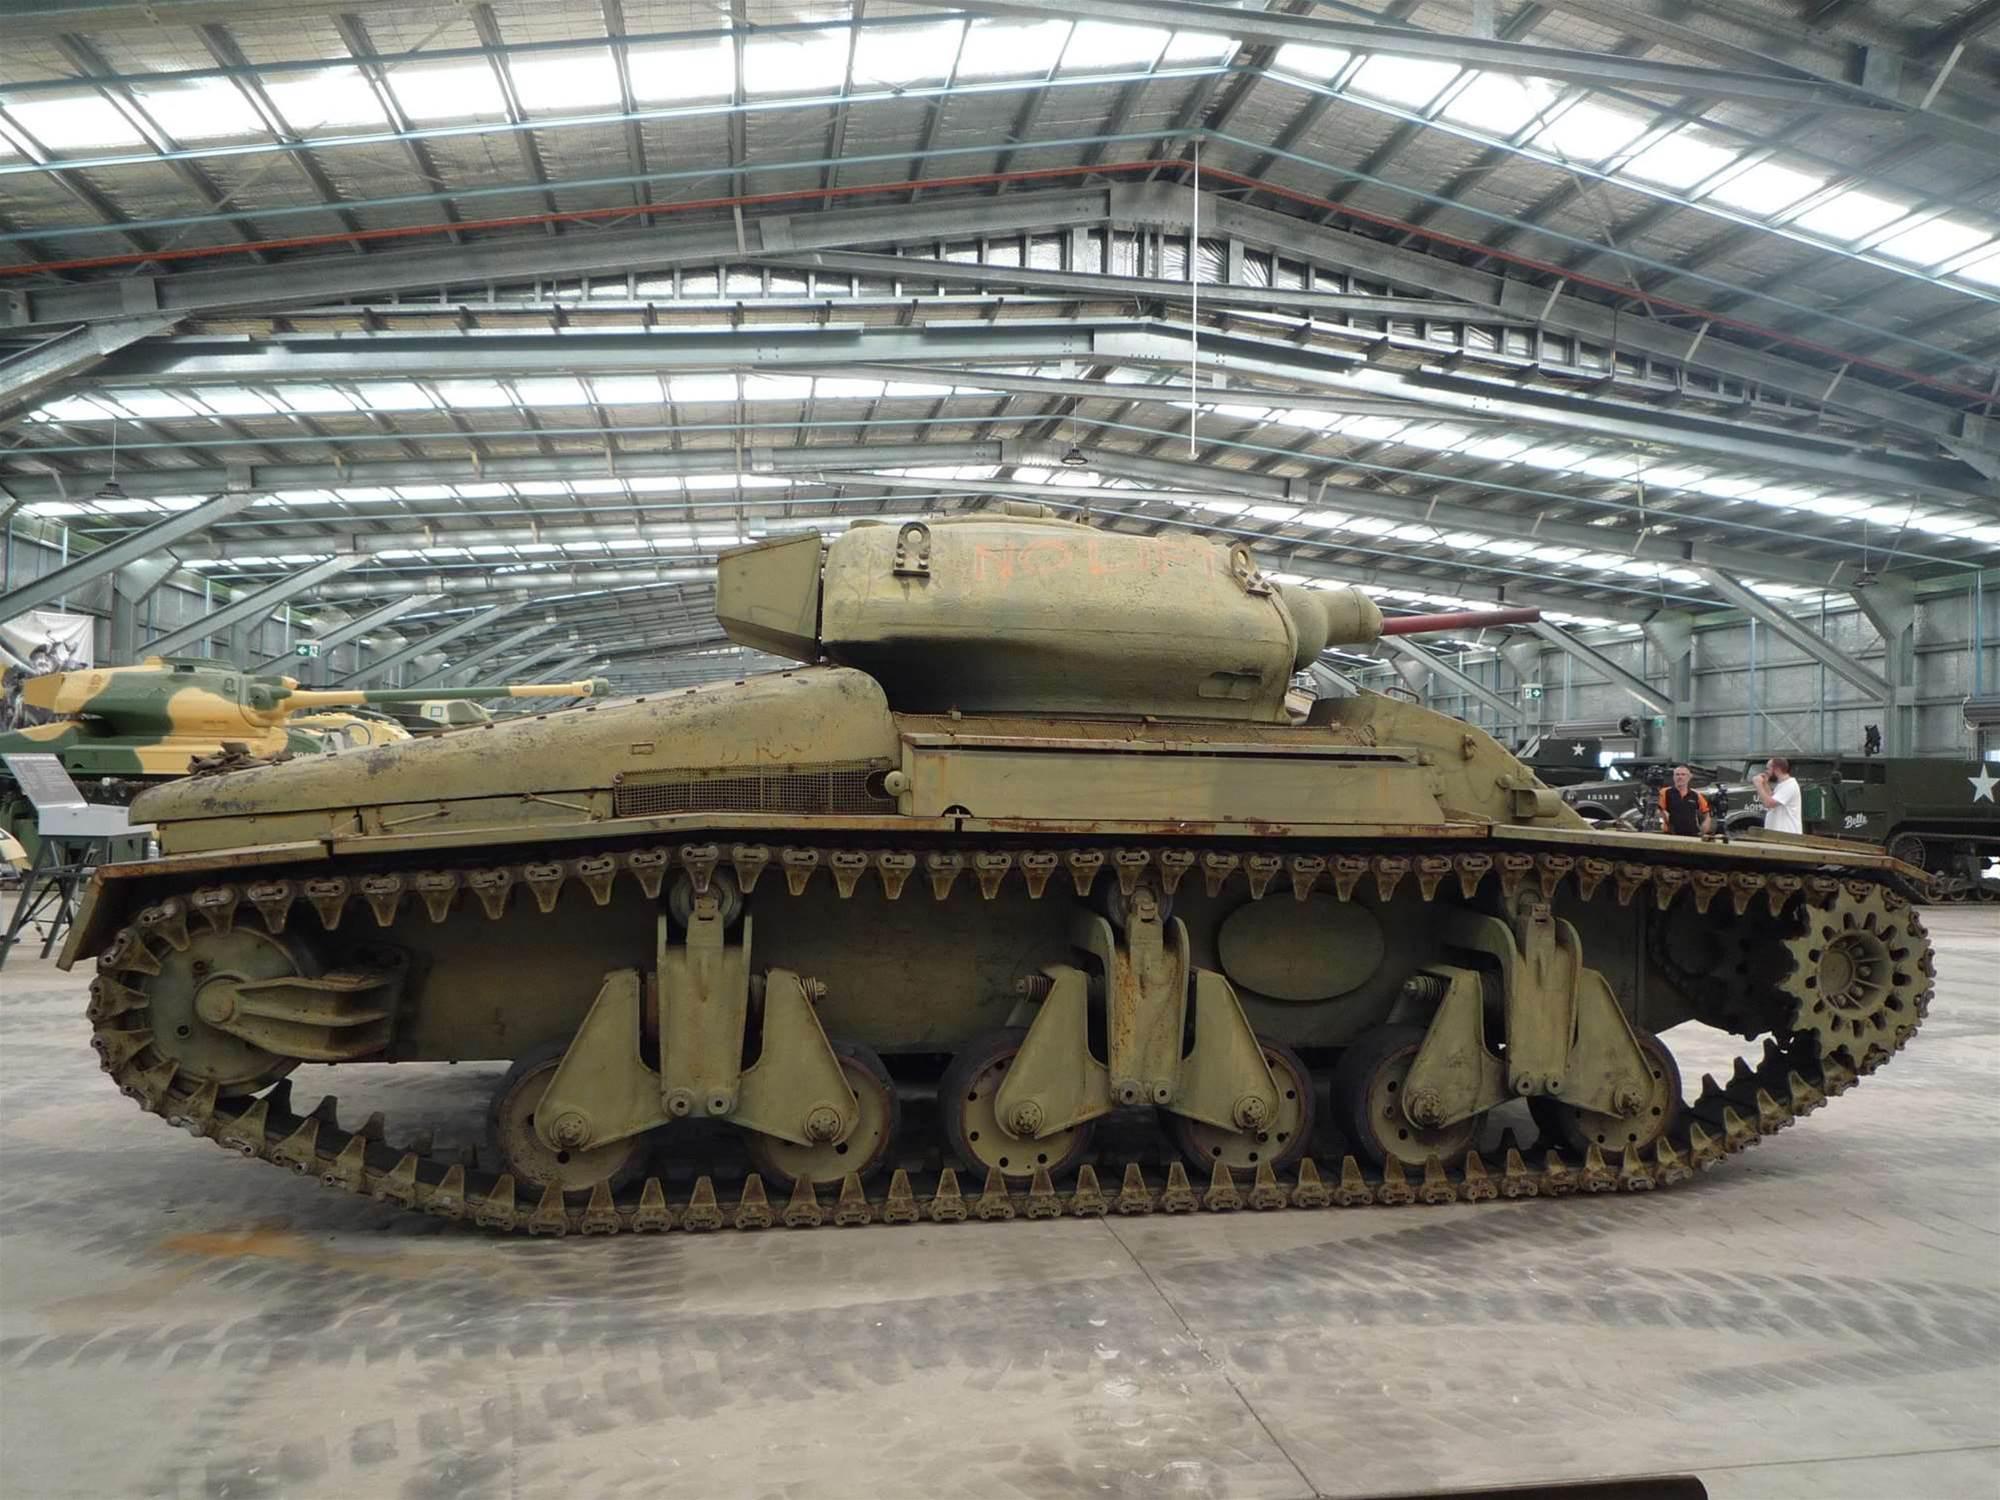 World of Tanks developer brings a classic Australian tank back home